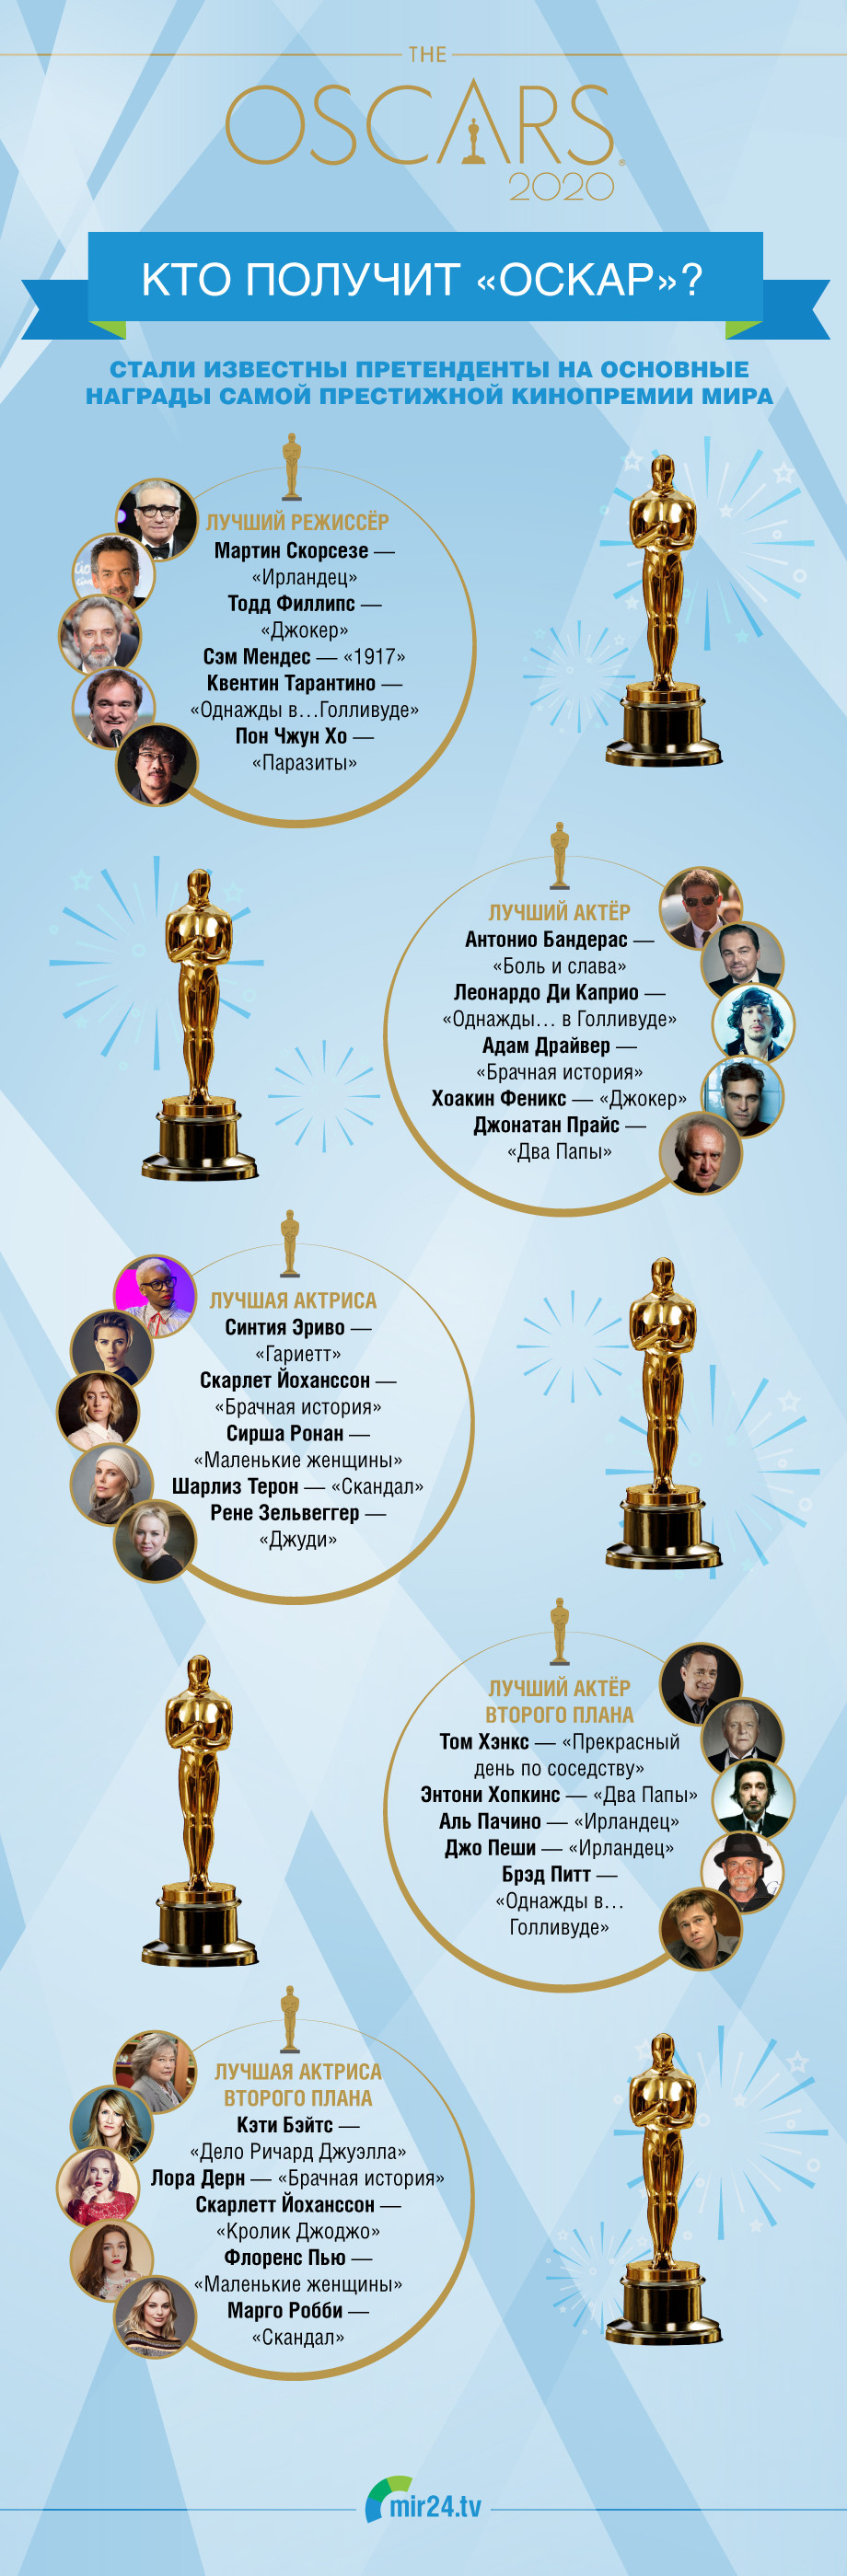 Кто претендует на «Оскар-2020»? ИНФОГРАФИКА